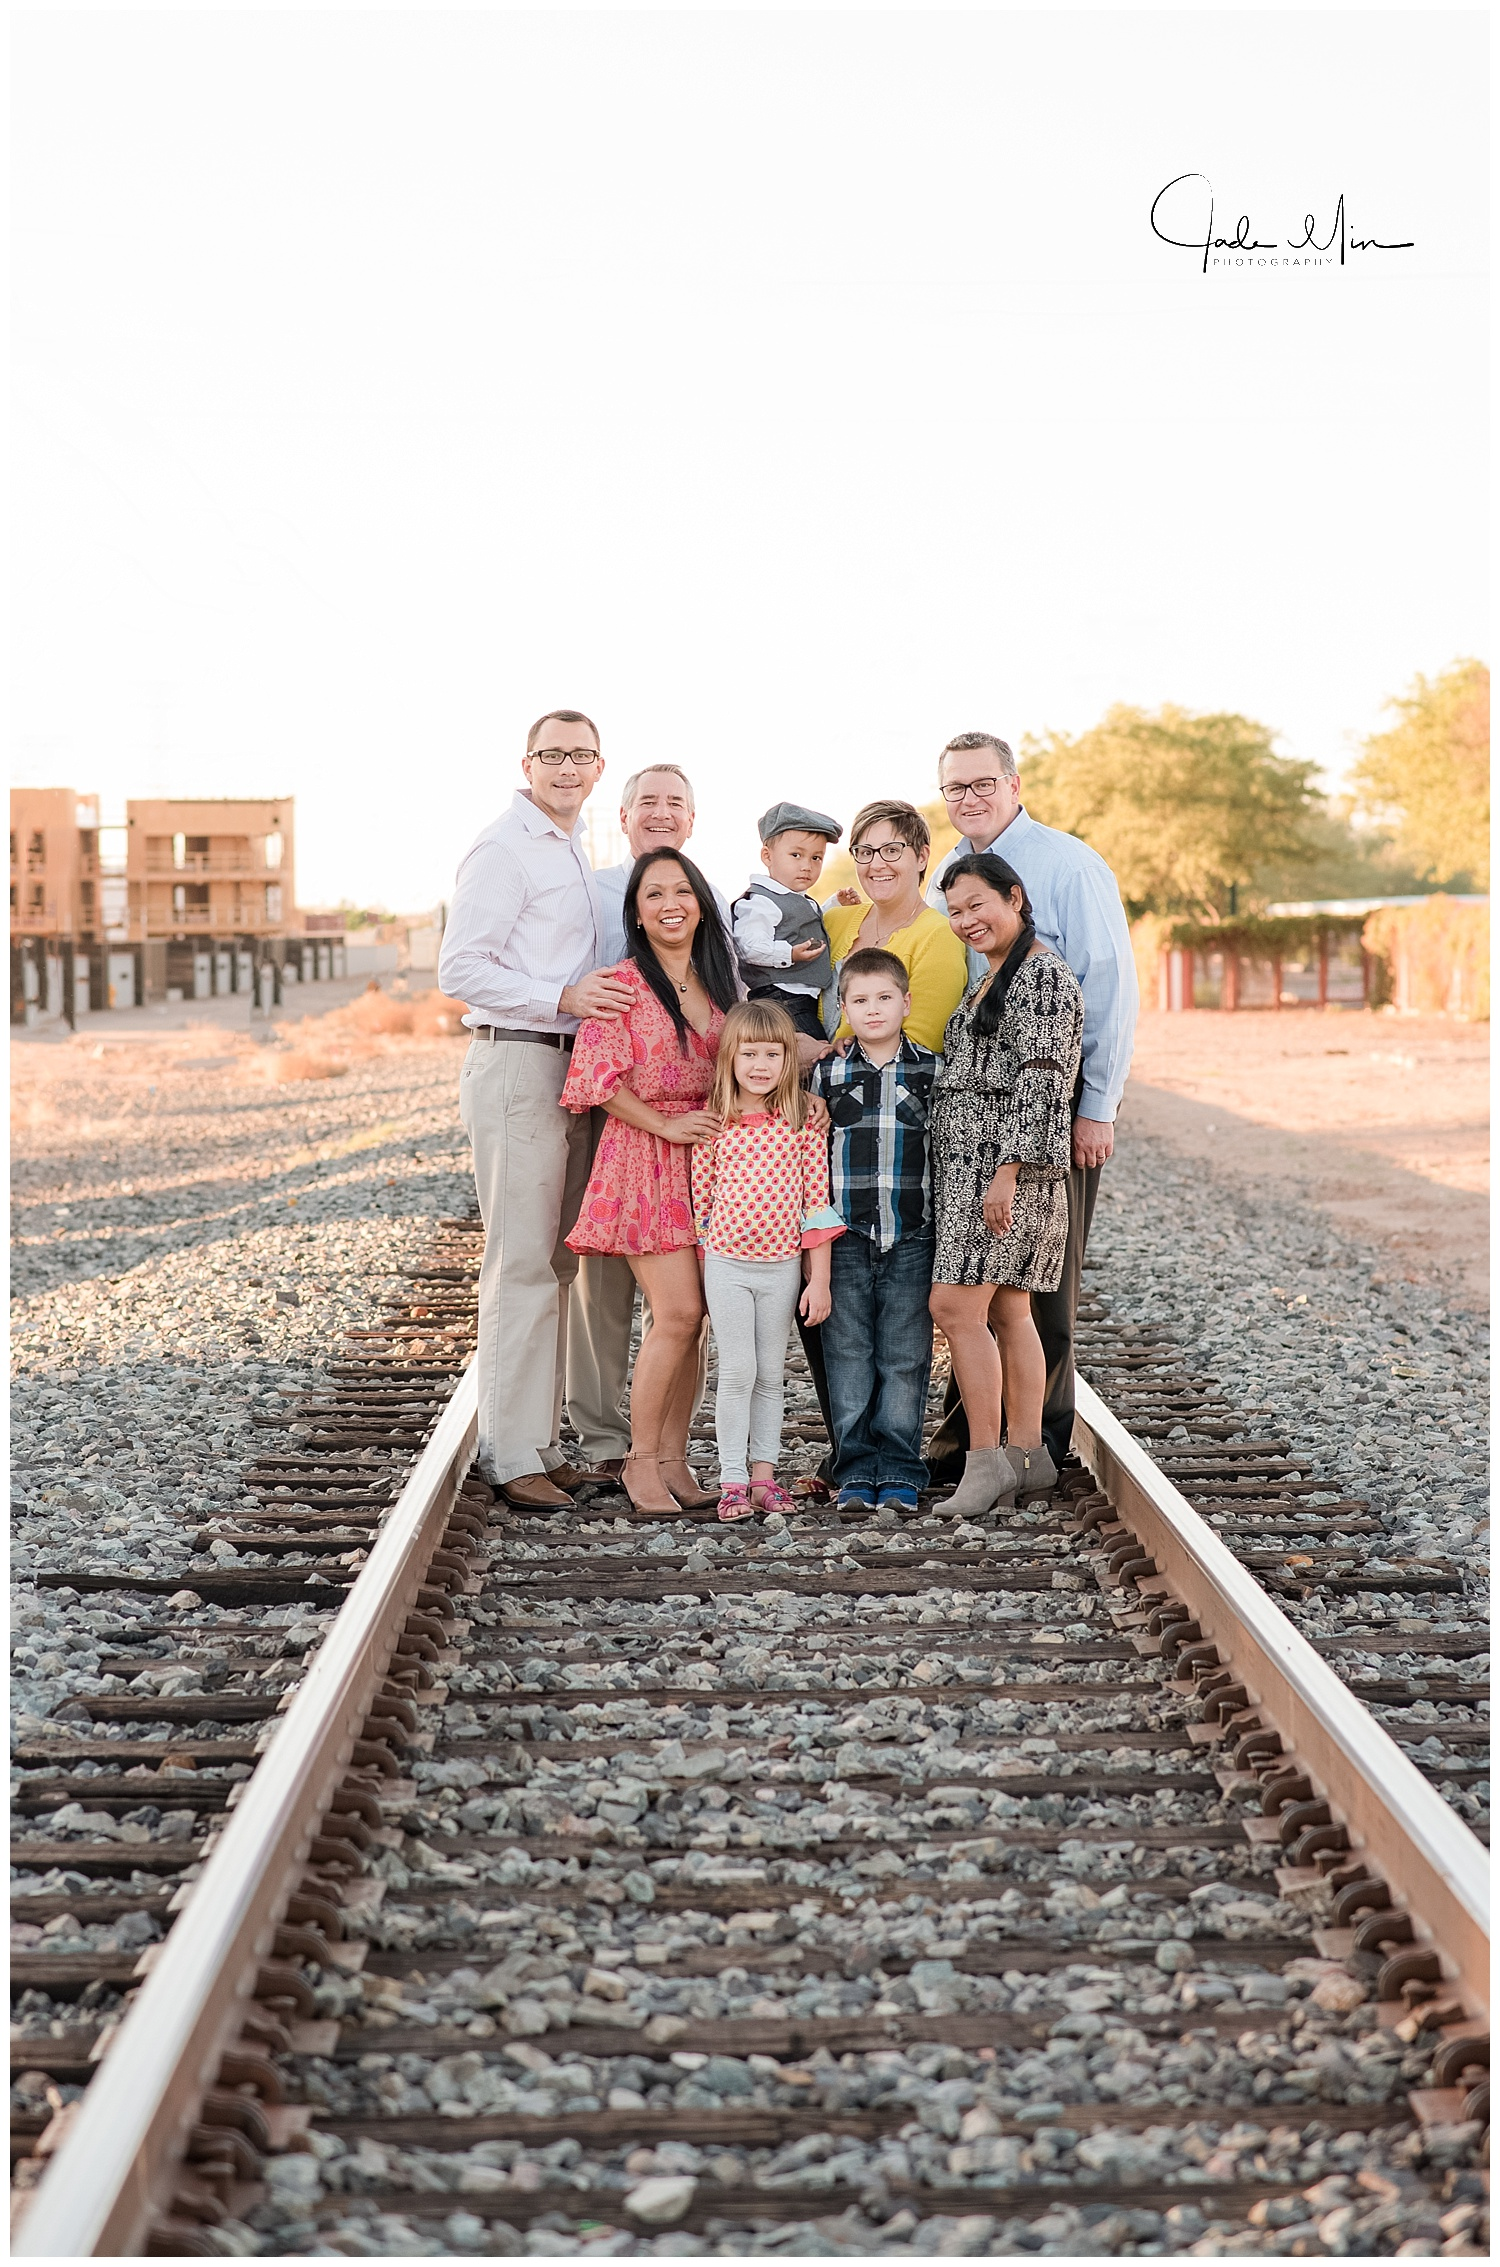 Downtown Gilbert, Arizona, Family Photography, Family Portraits, Children's Photography